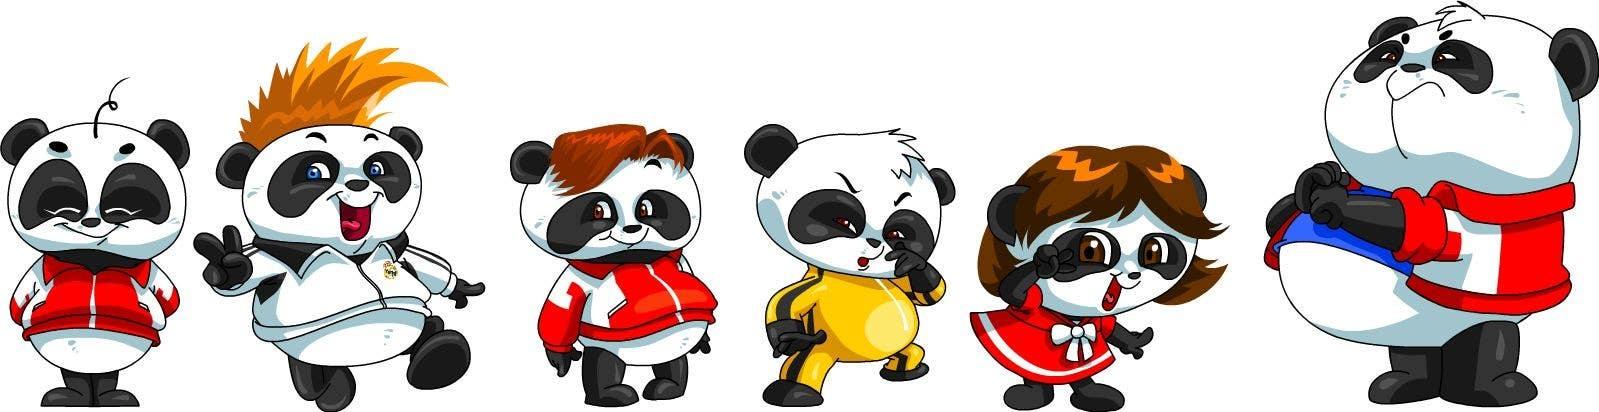 Contest Entry #77 for Illustration Design for Animation illustration for Panda cubs.